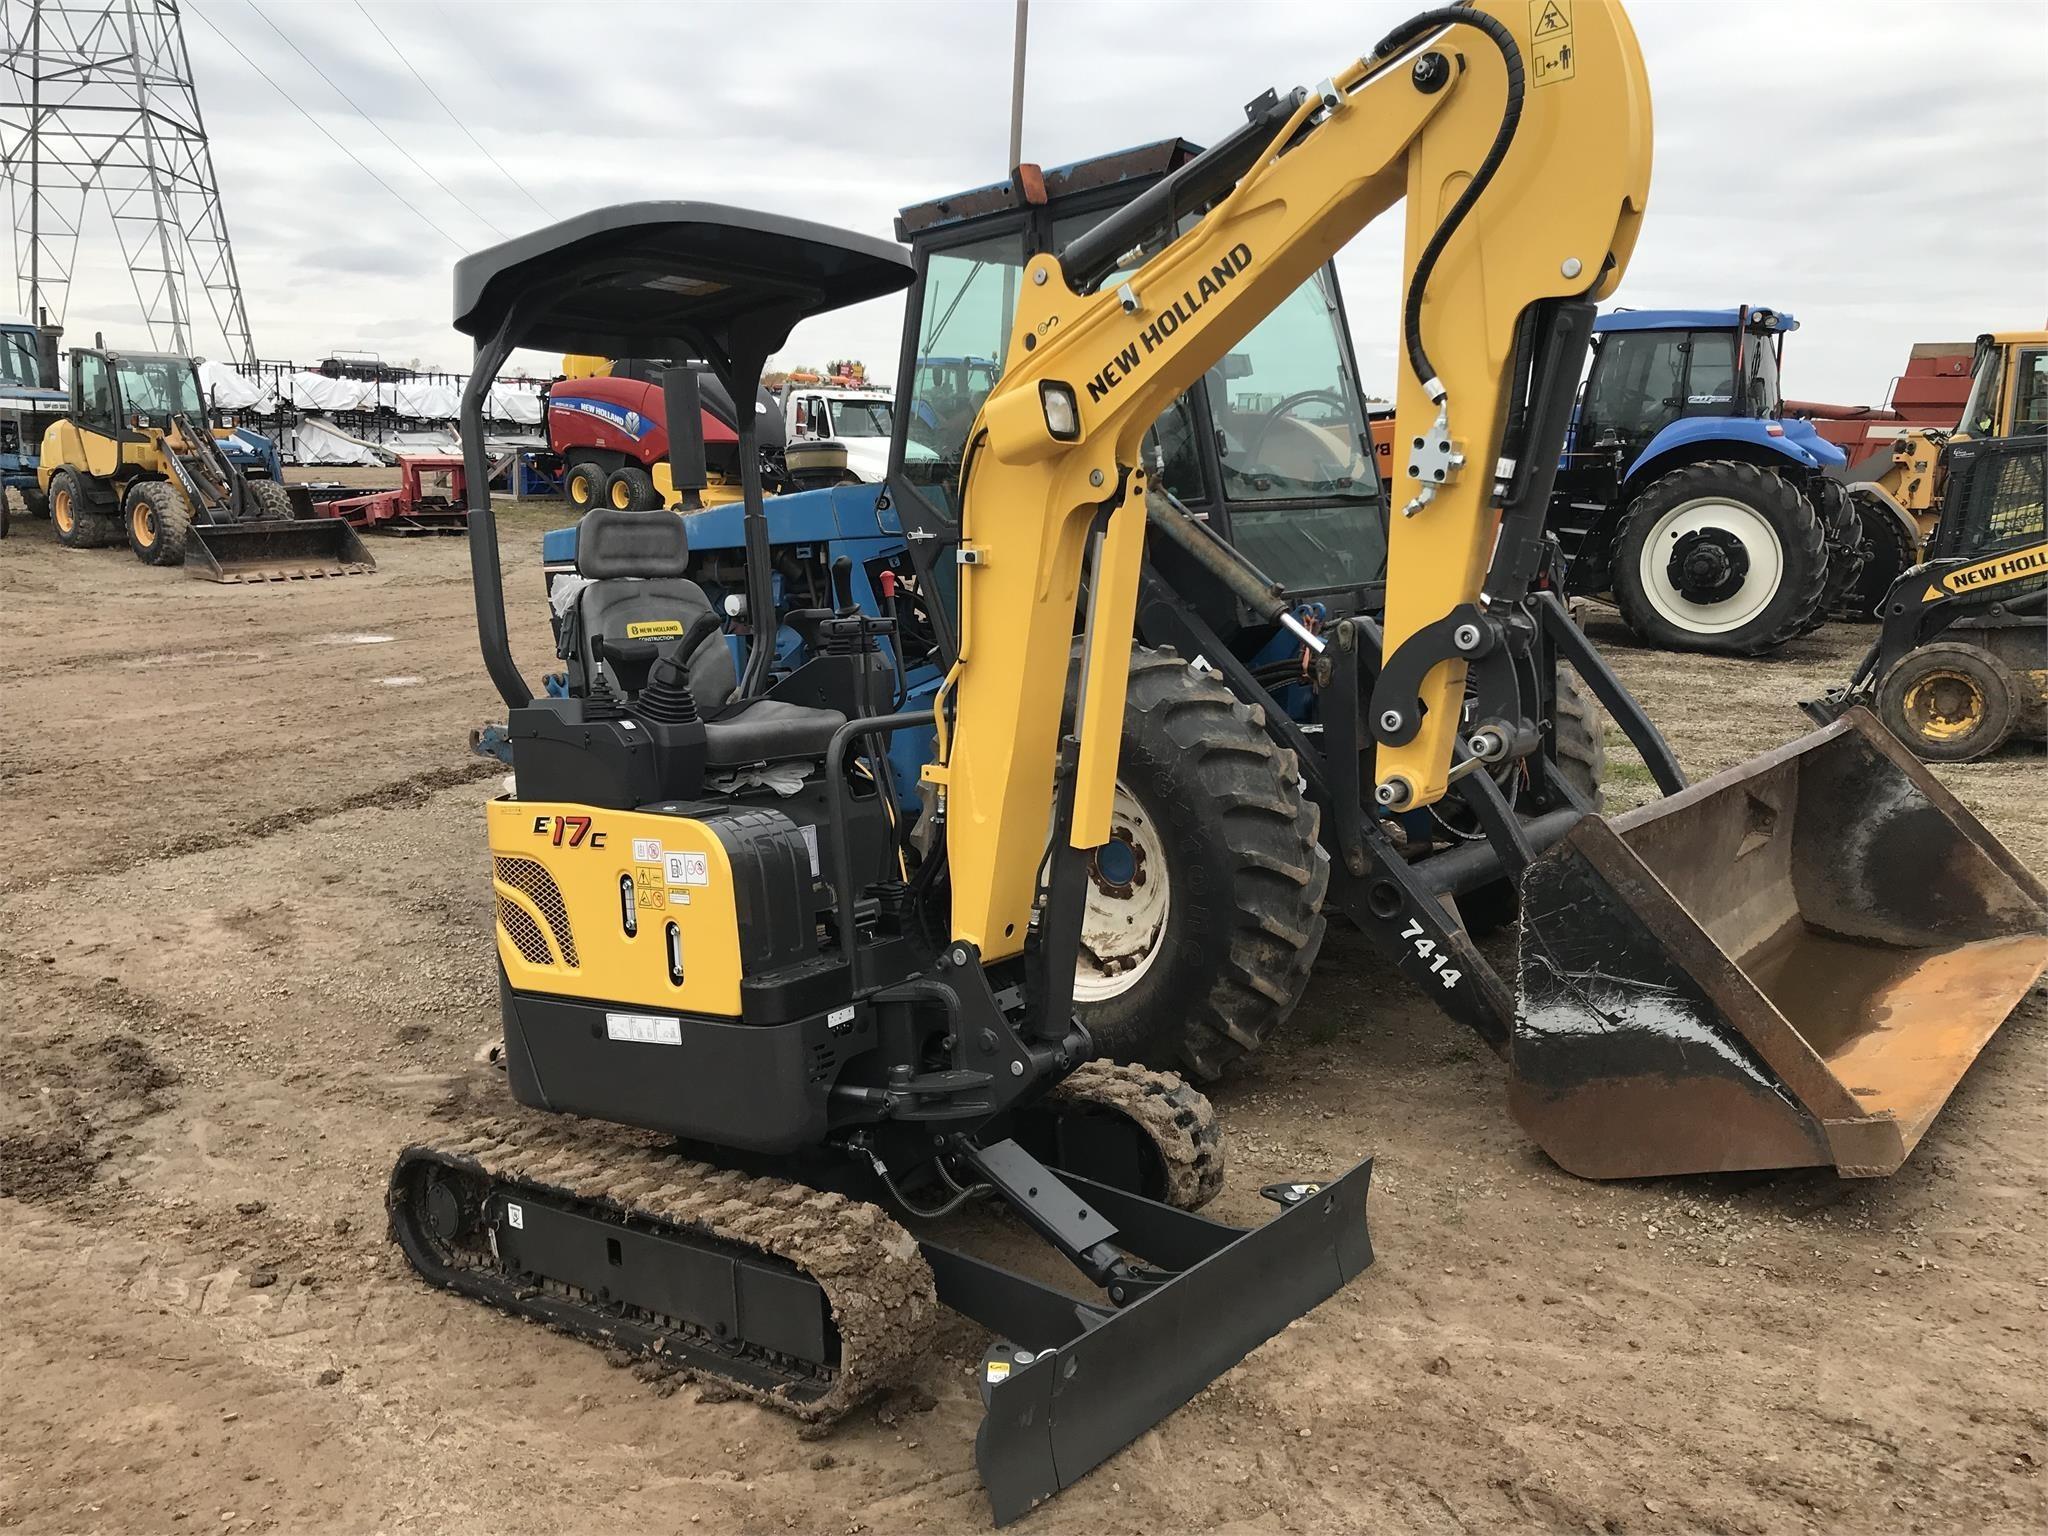 2019 New Holland E17C Excavators and Mini Excavator